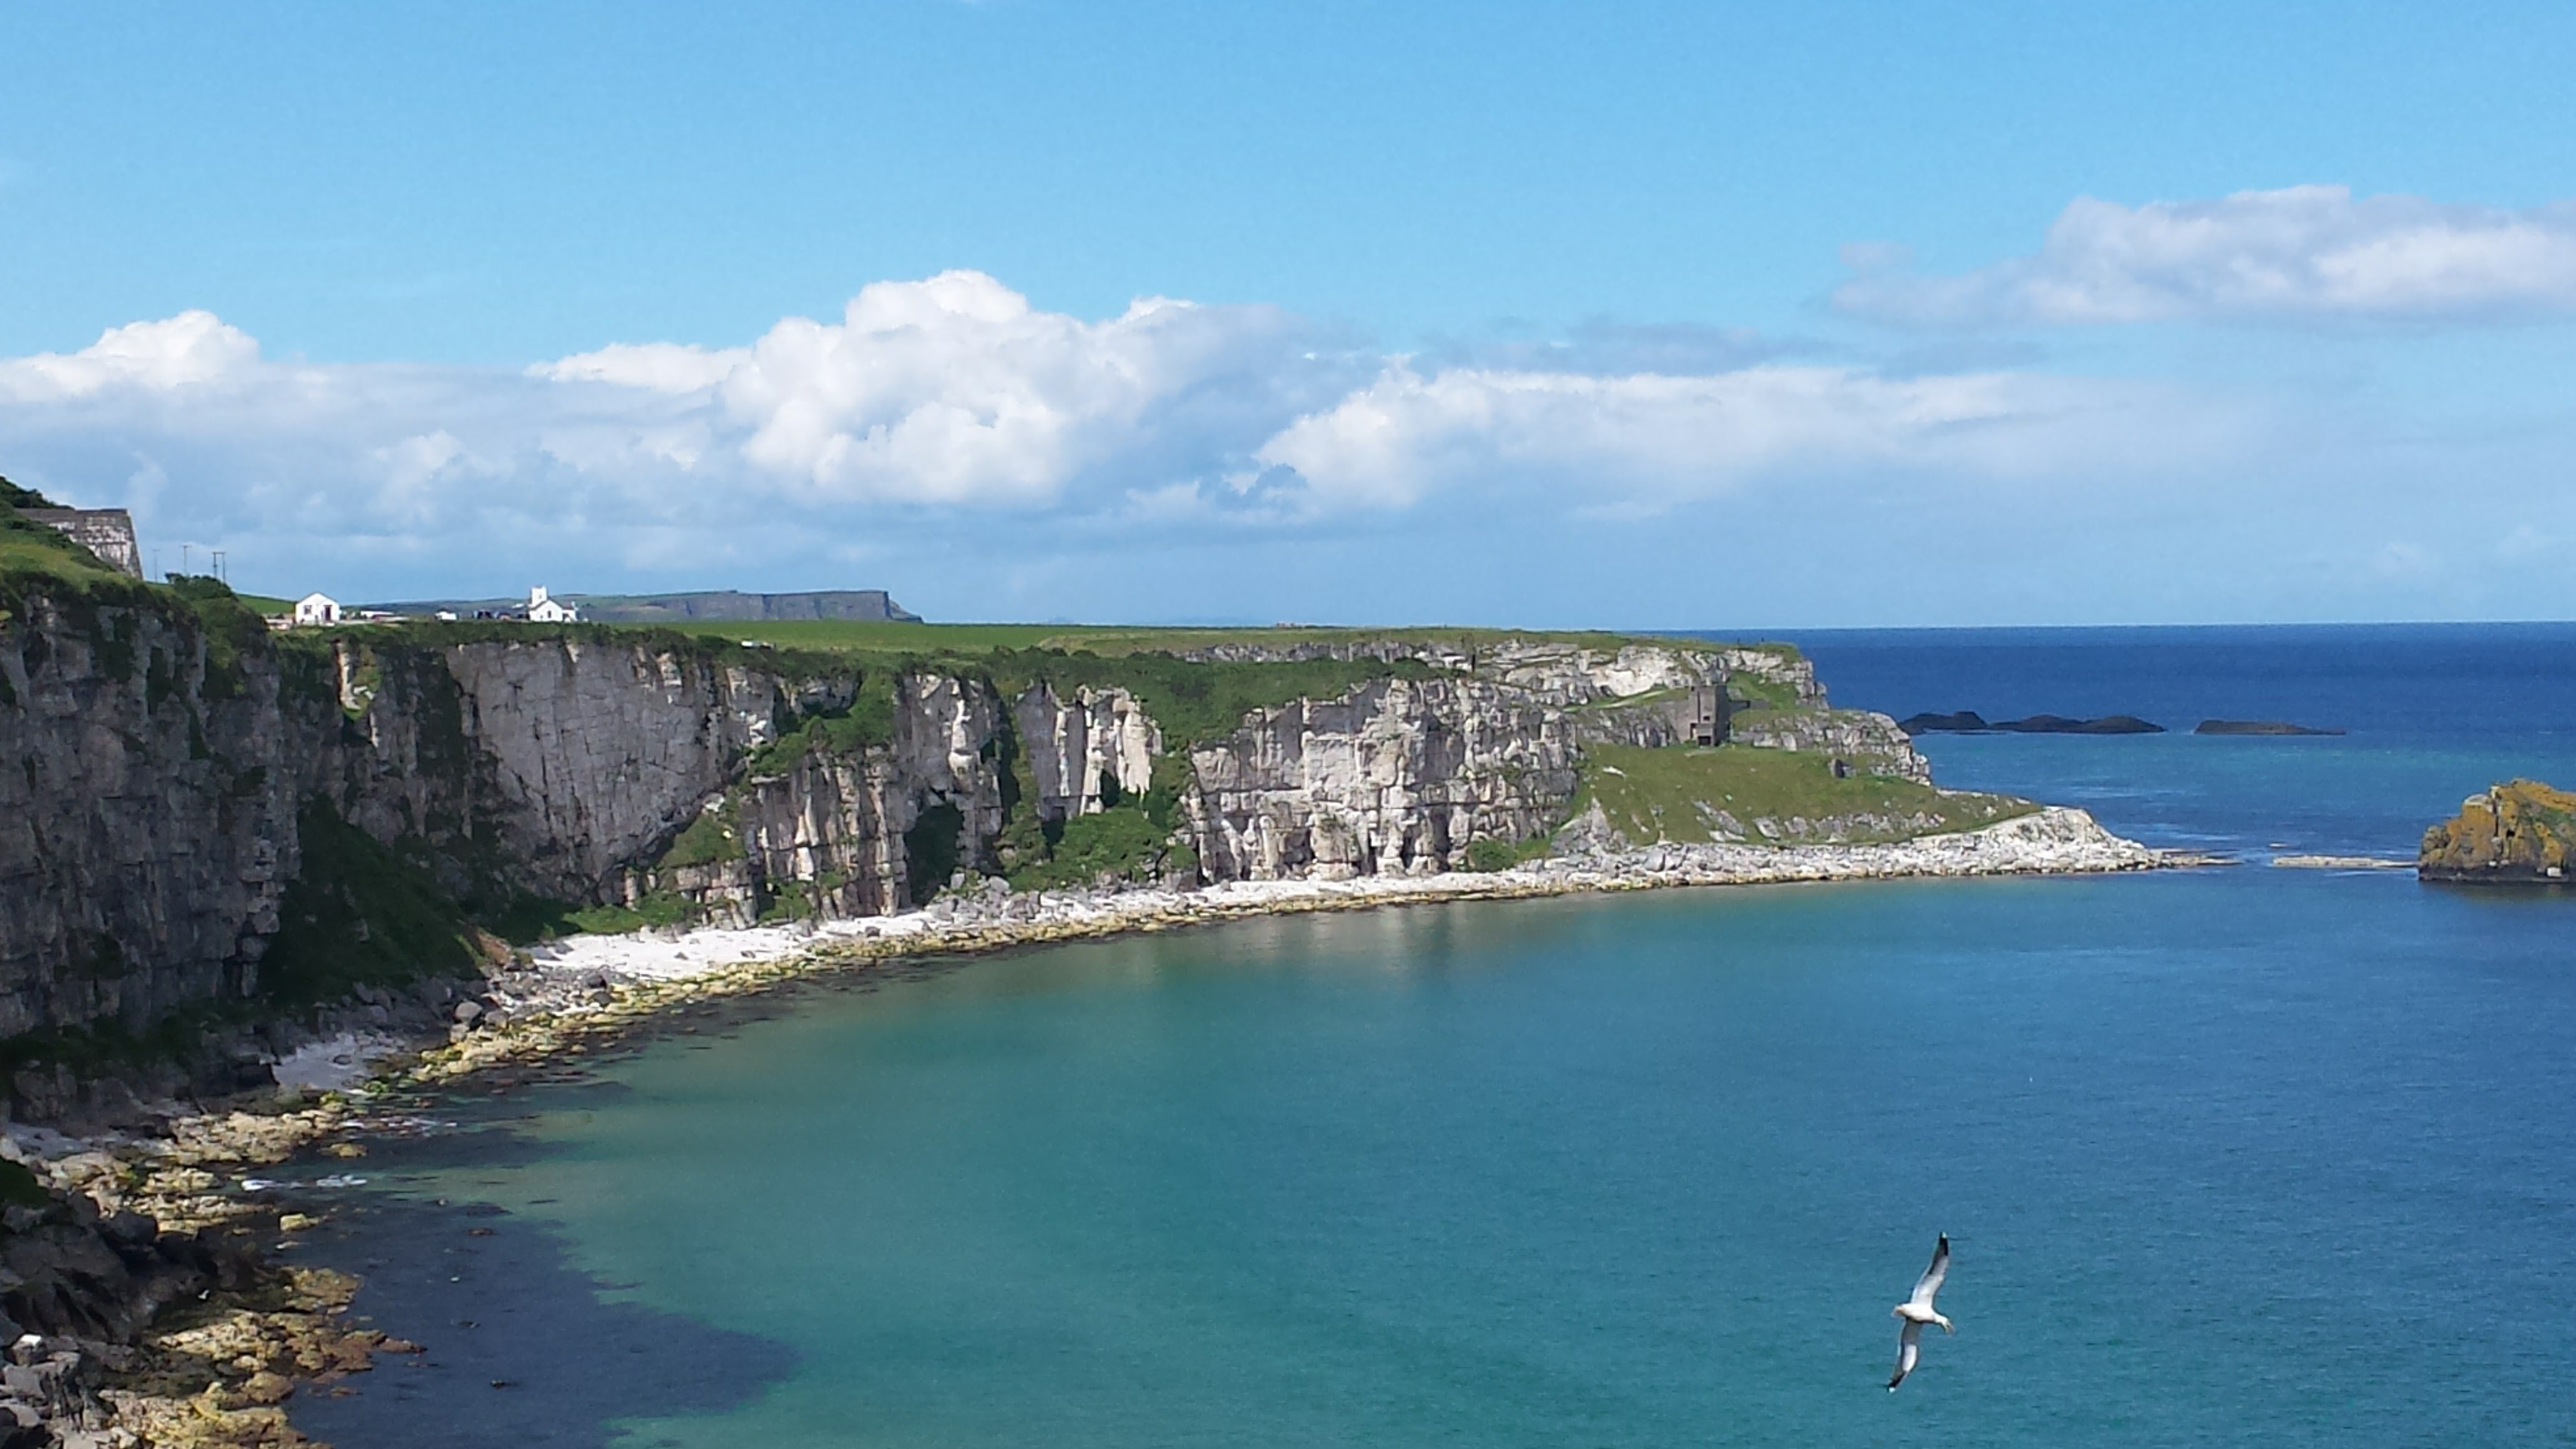 Coast near Portsrush, Northern Ireland